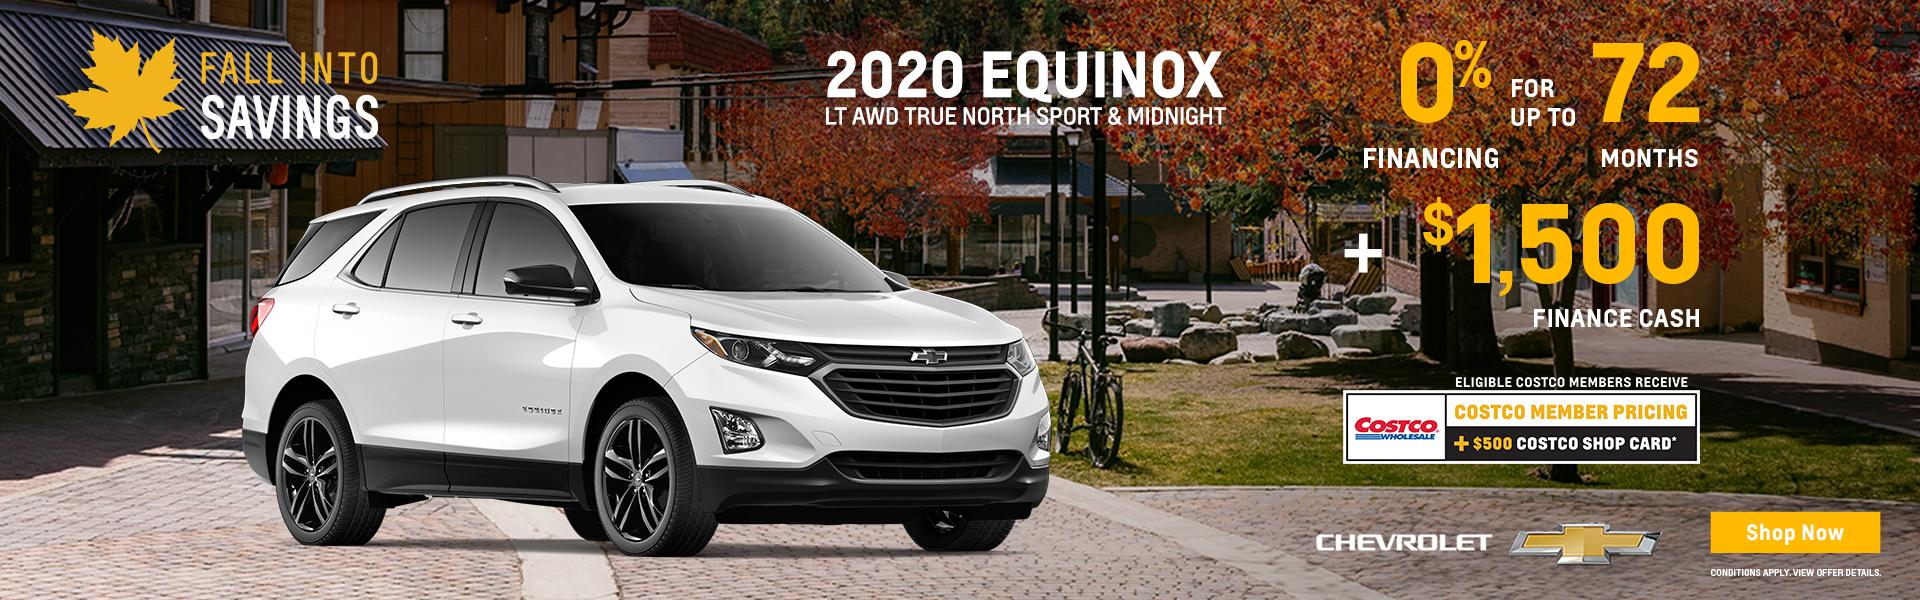 GMCCA - Western - Chevrolet Equinox